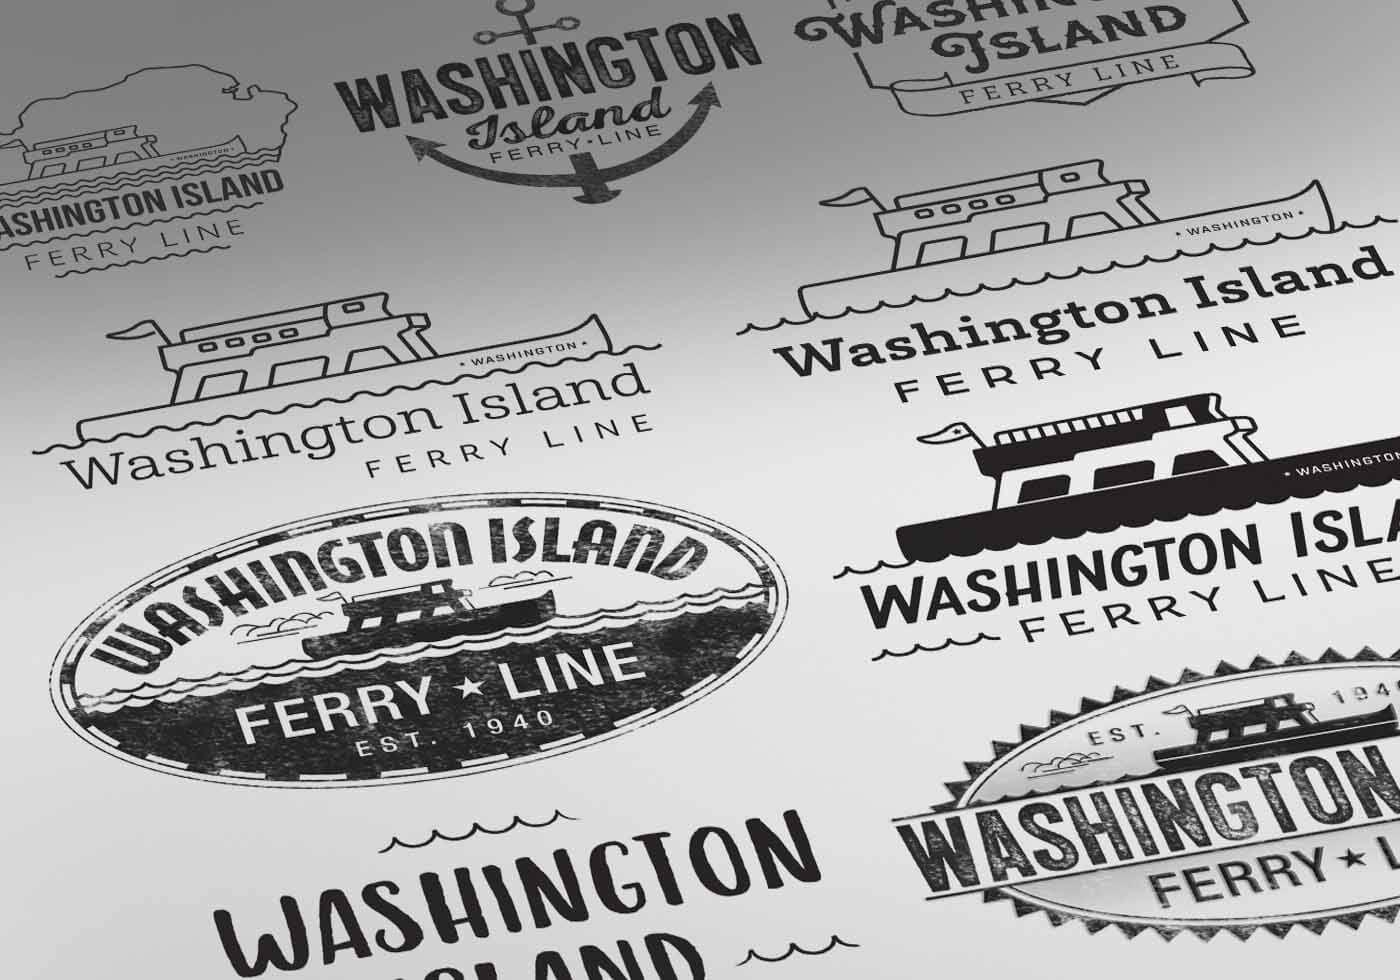 Washington Island Ferry logo design options